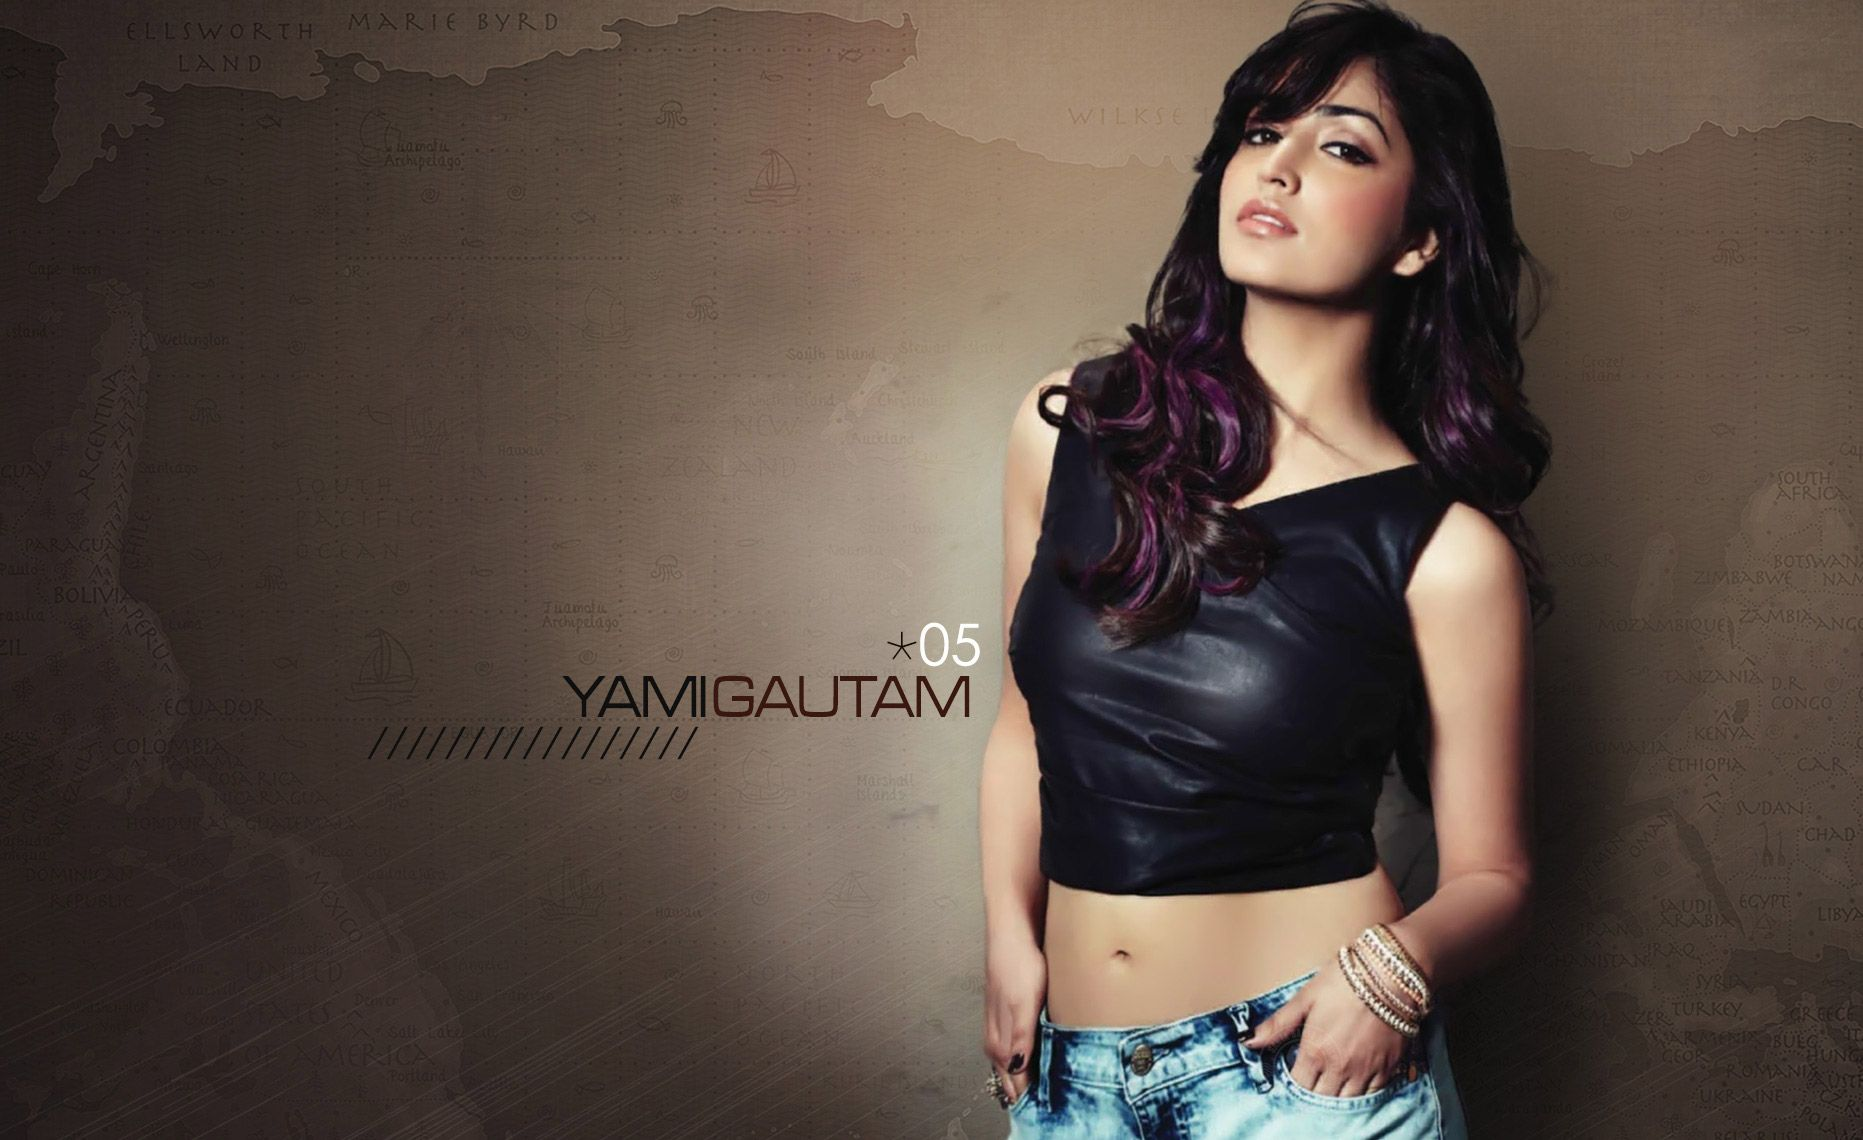 Latest Hd Photo Yami Gautam 1080p New